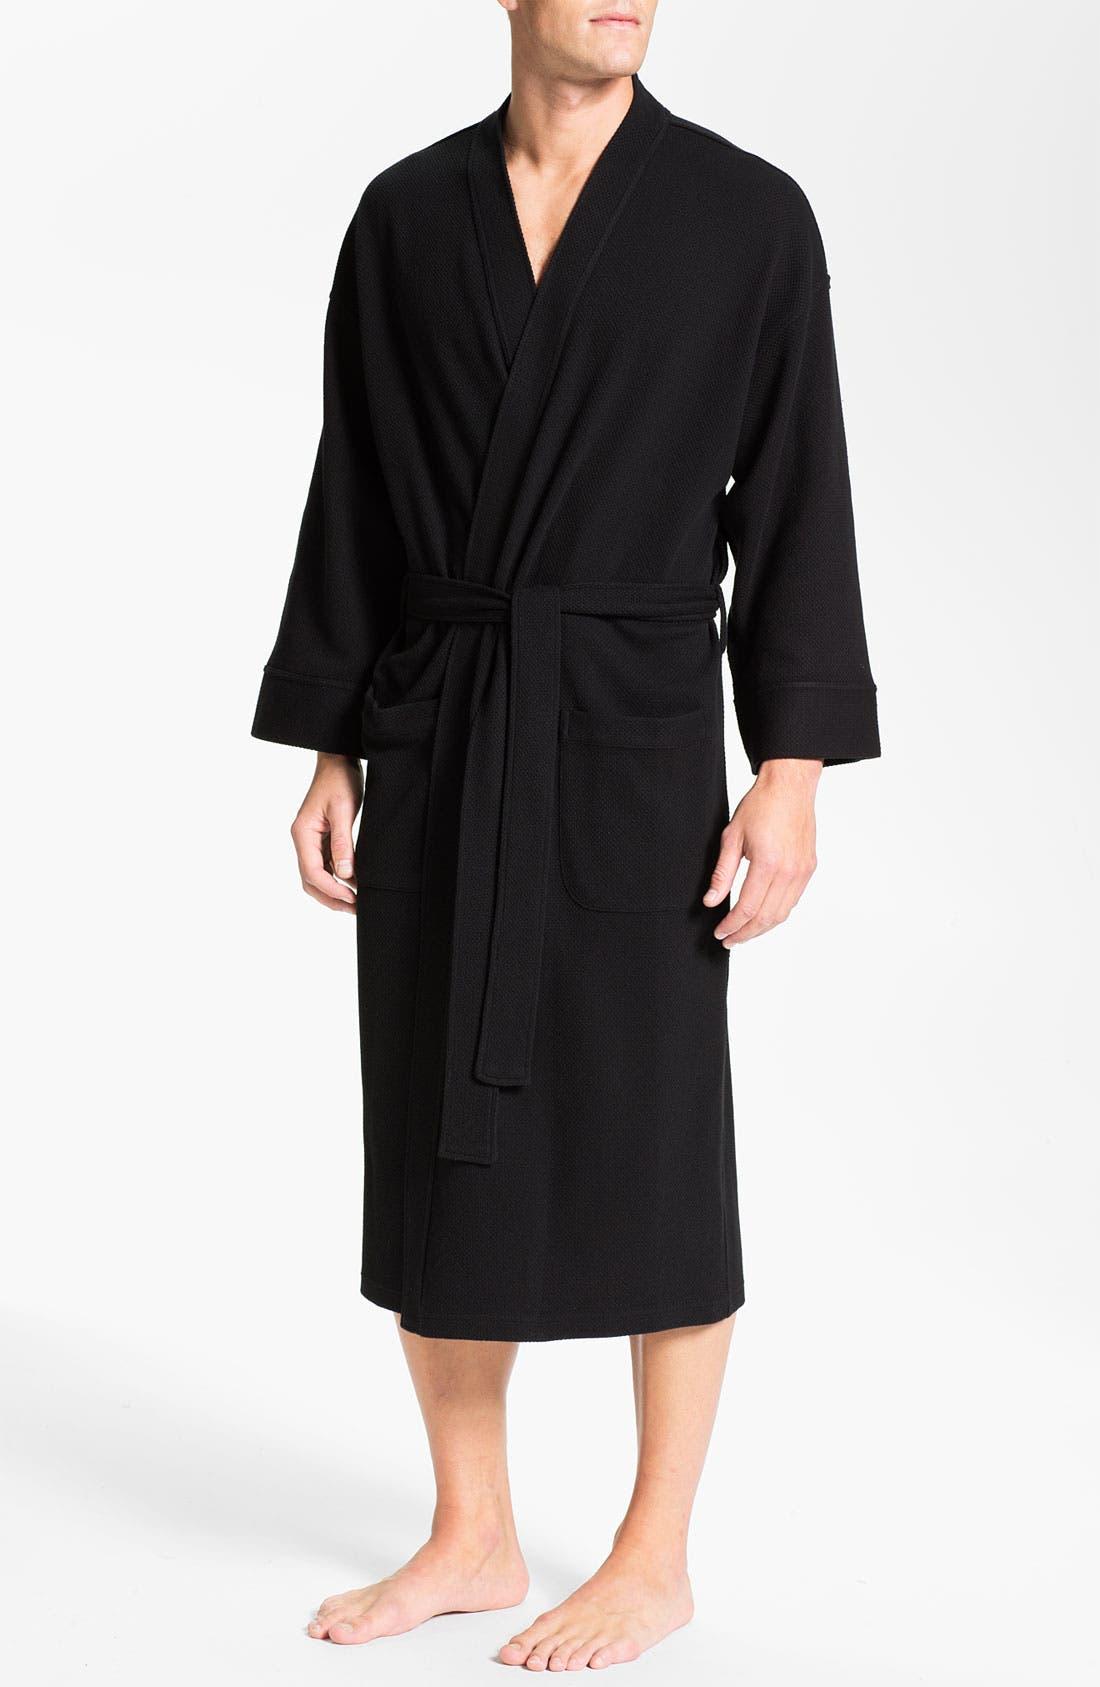 Alternate Image 1 Selected - Nordstrom Men's Shop Thermal Robe